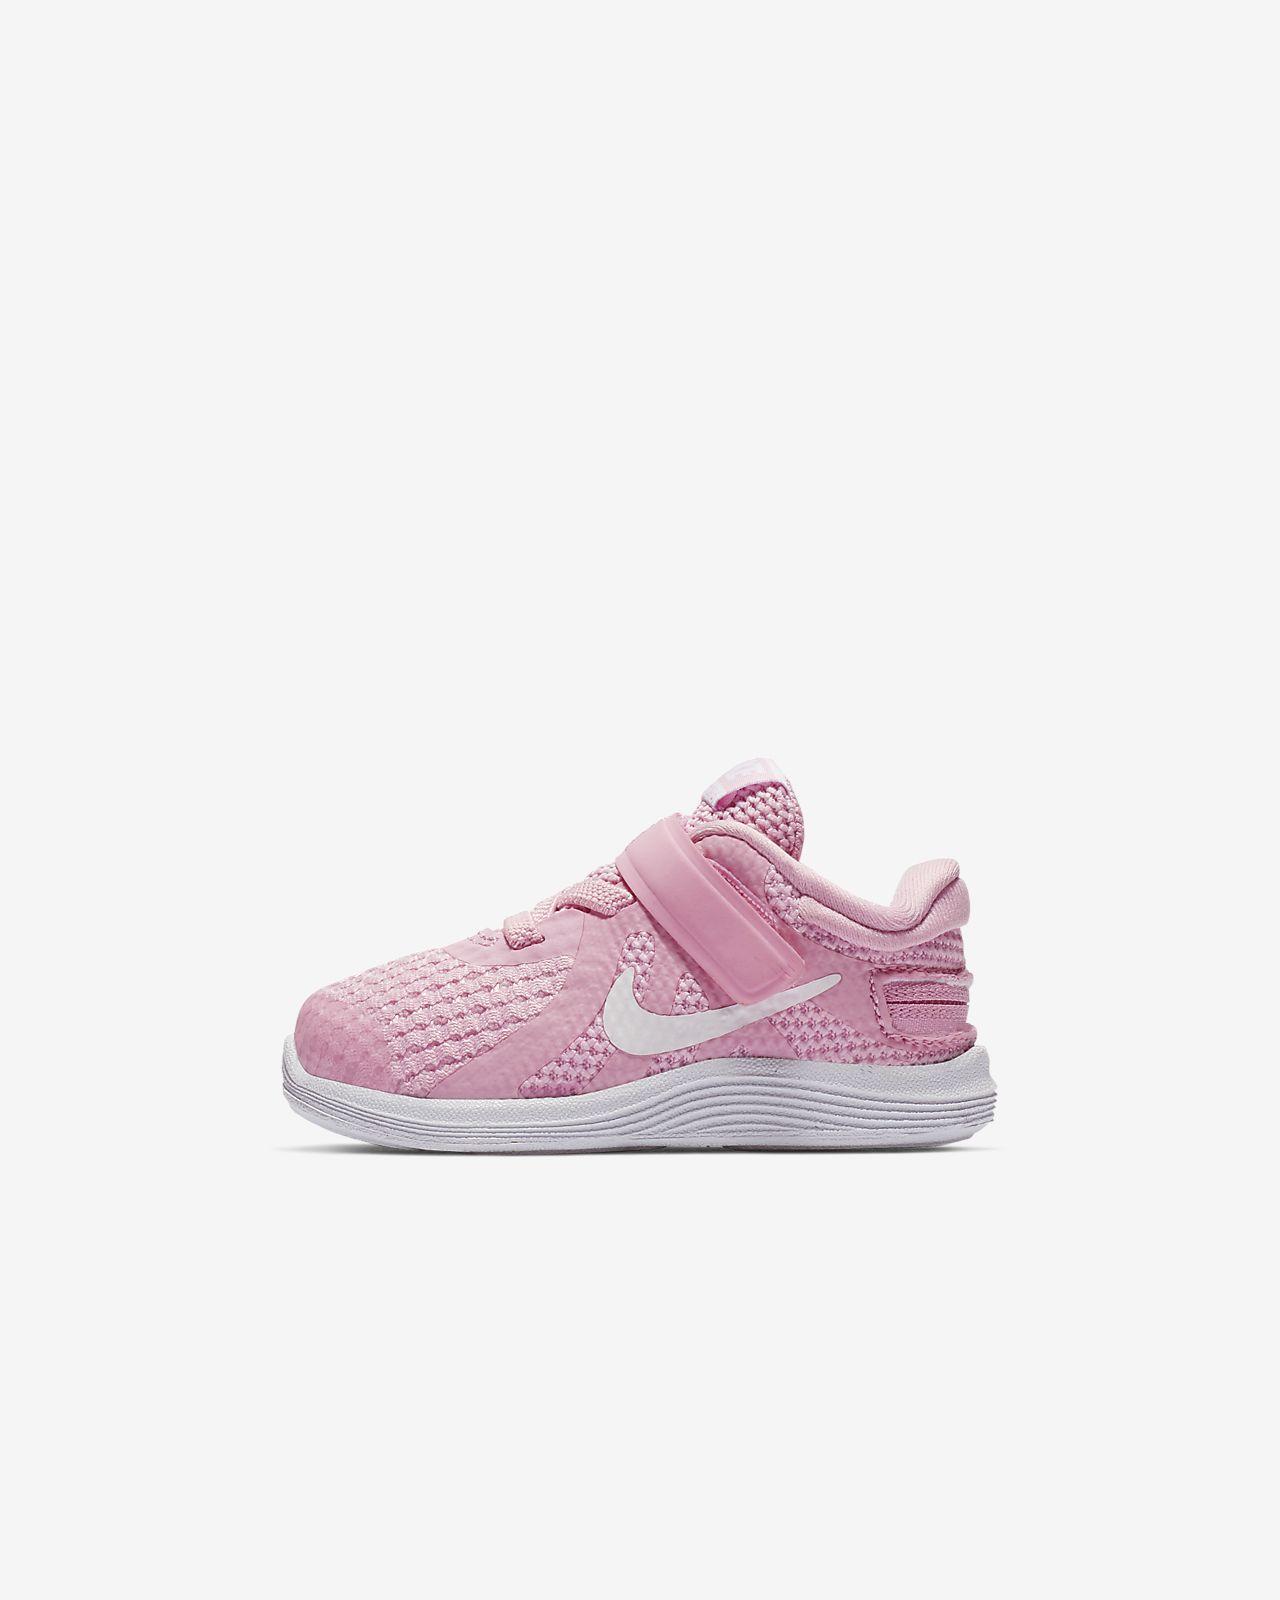 on sale dc343 5ea6a ... Sko Nike Revolution 4 FlyEase för baby små barn